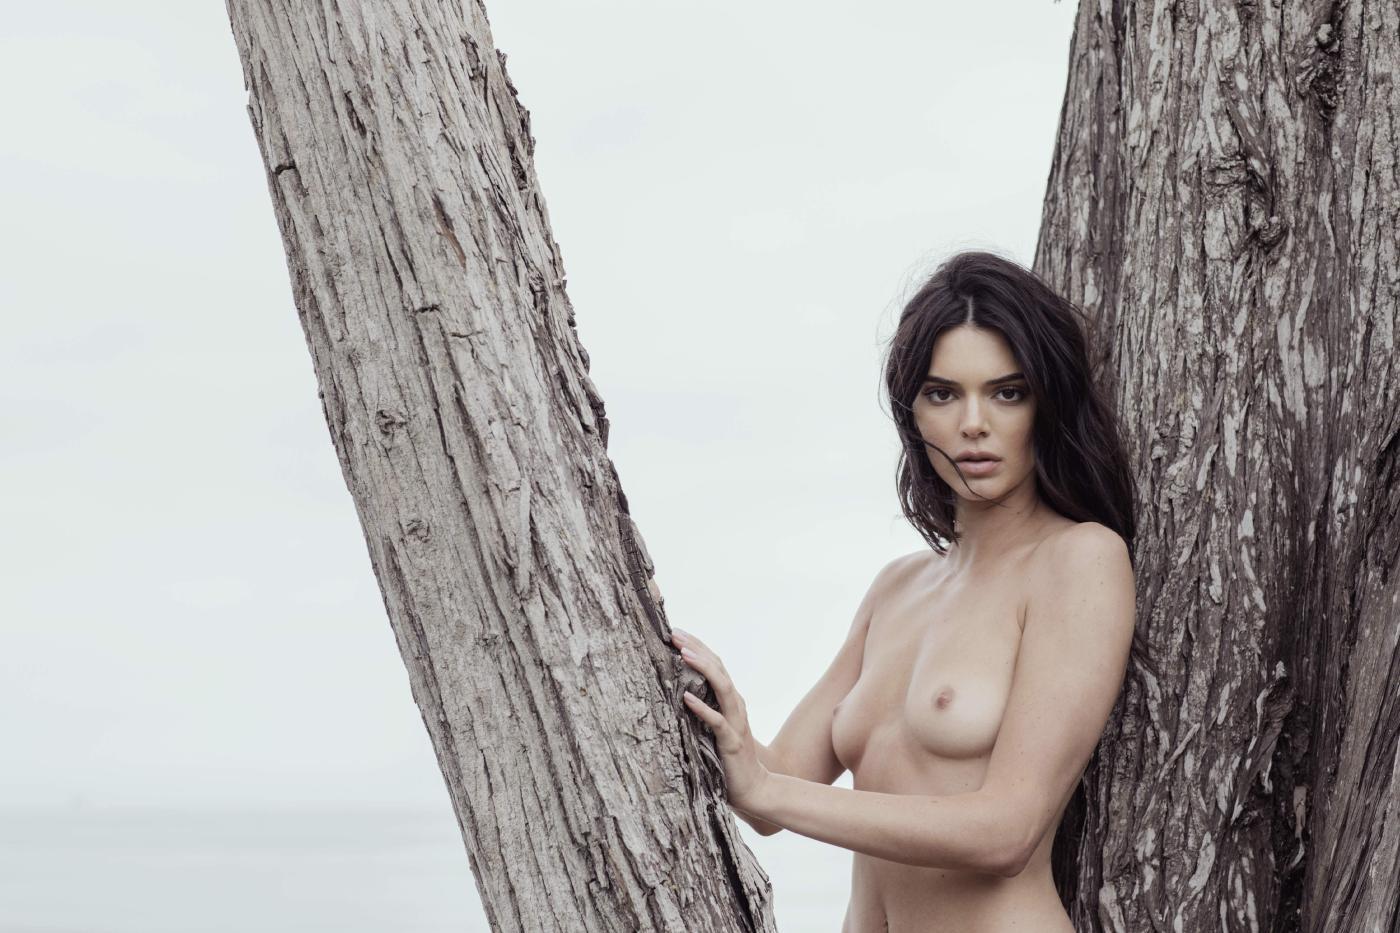 Kendall Jenner Nude Magazine Photoshoot Leaked Mptdll